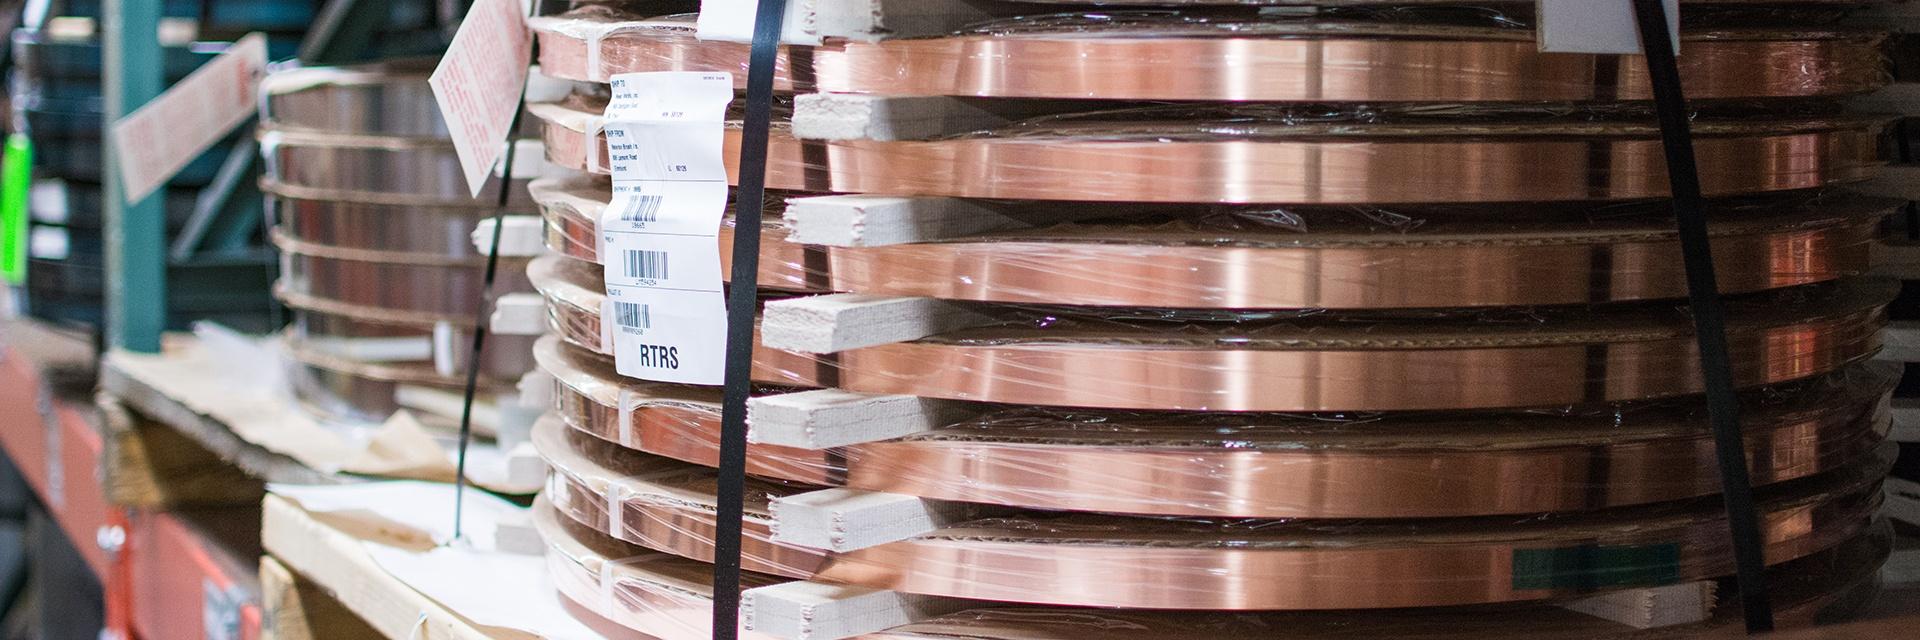 Mead_Beryllium-Copper_Stock-Items_Header.jpg